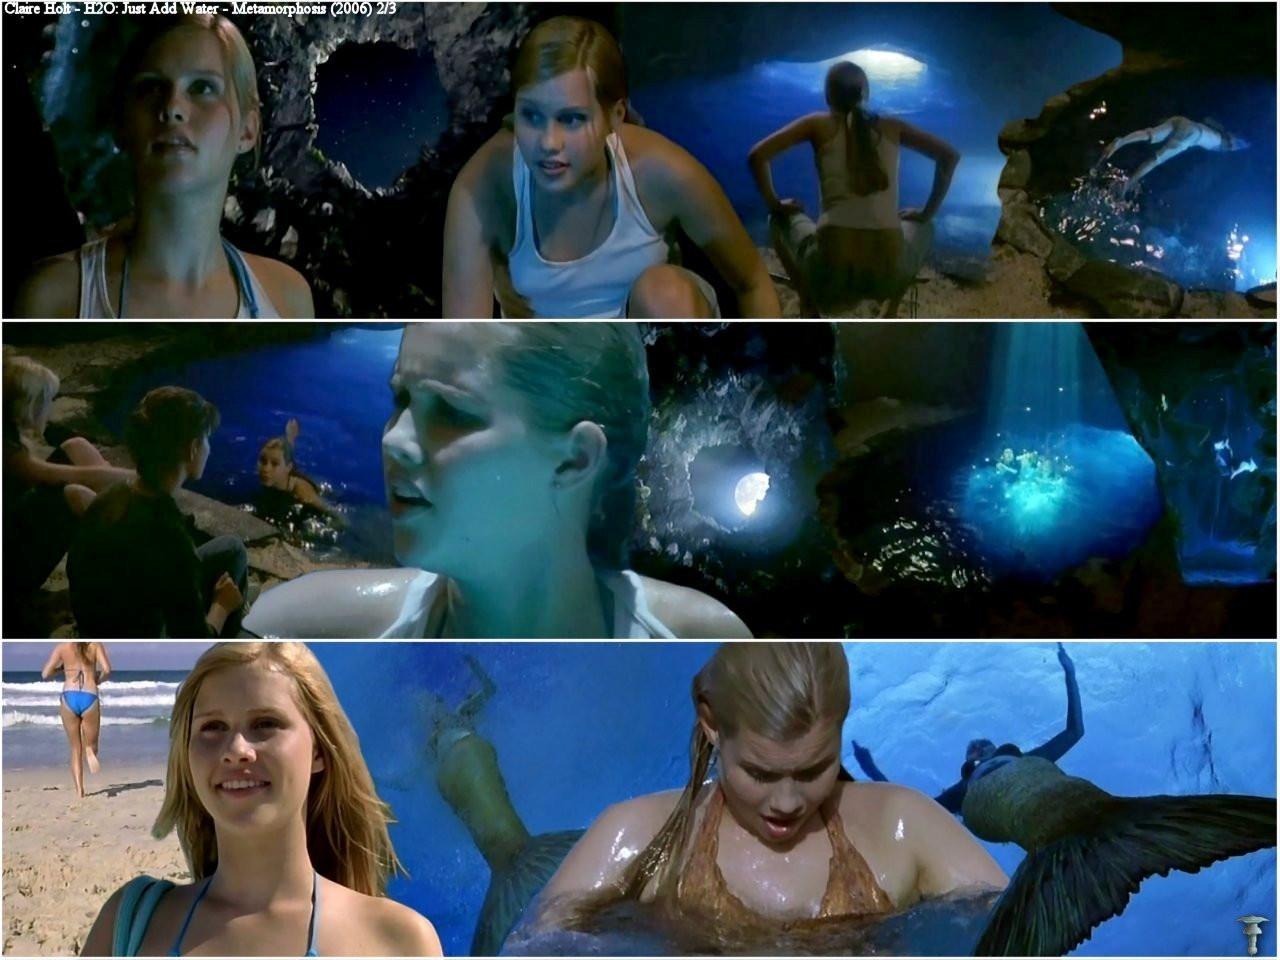 H2o Plötzlich Meerjungfrau Ausmalbilder Neu H2o Just Add Water Images Collagen Of H2o Just Add Water Hd Sammlung